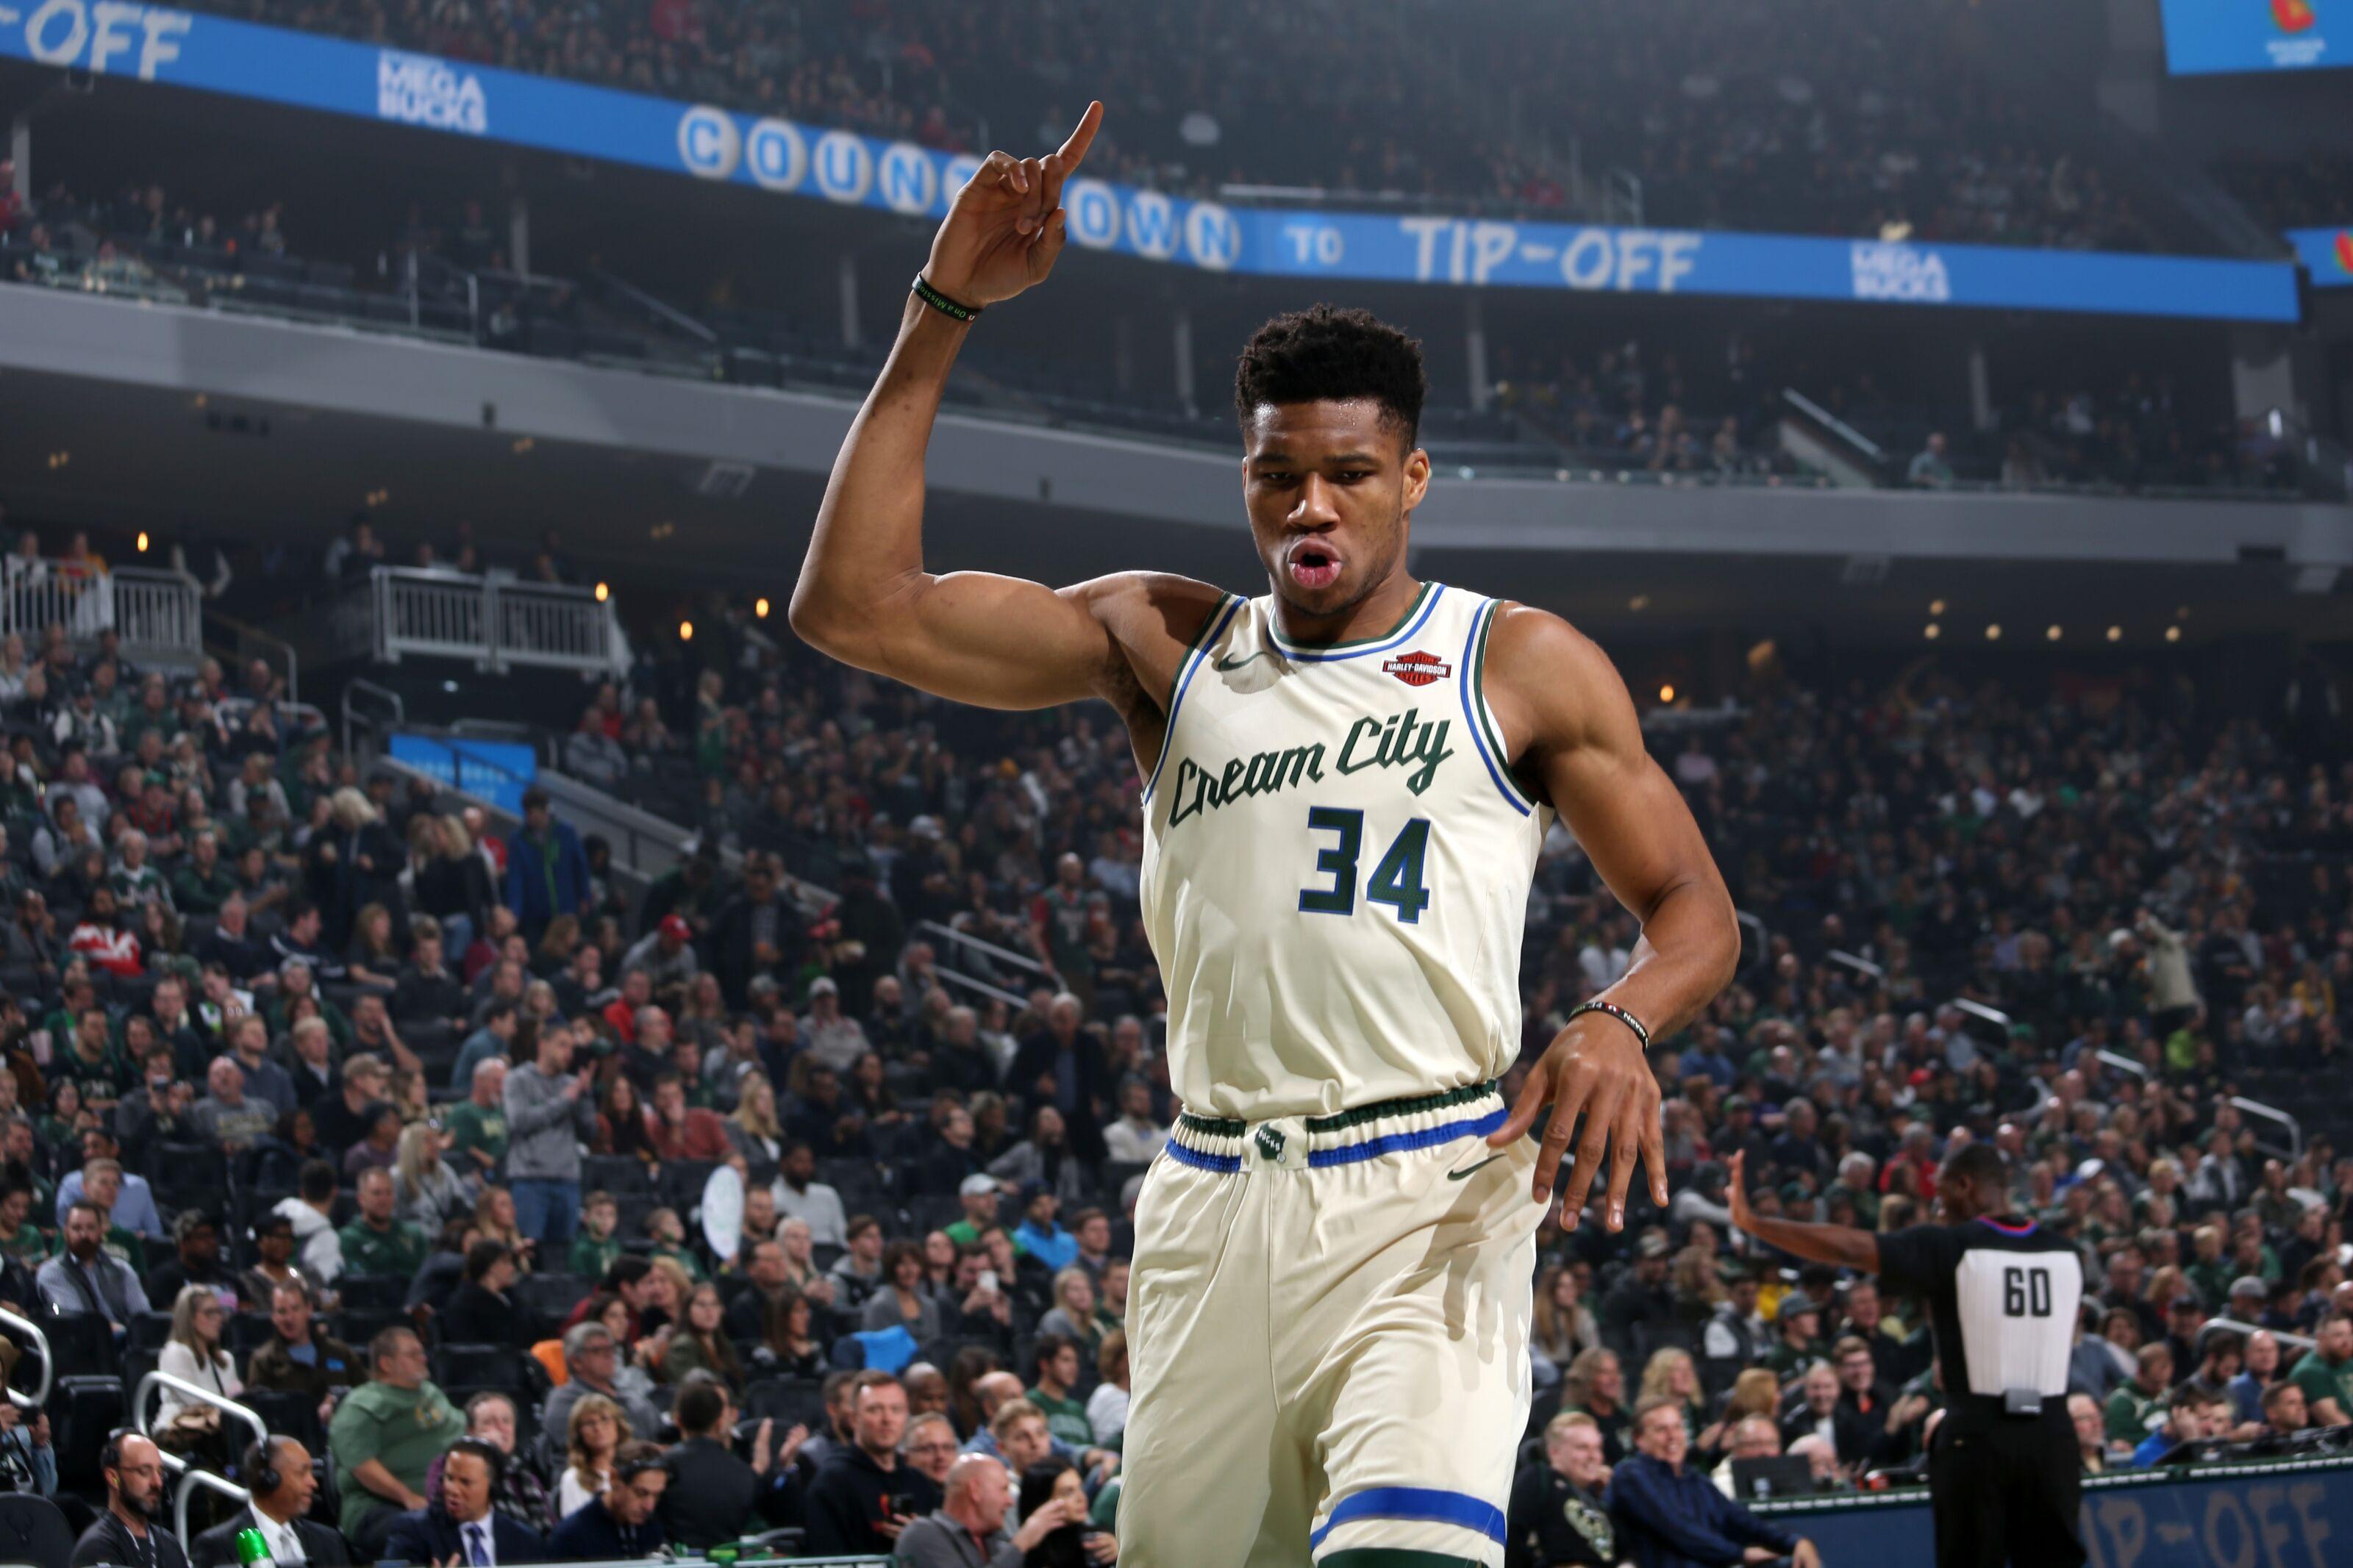 Milwaukee Bucks: The chance at a potentially historic streak